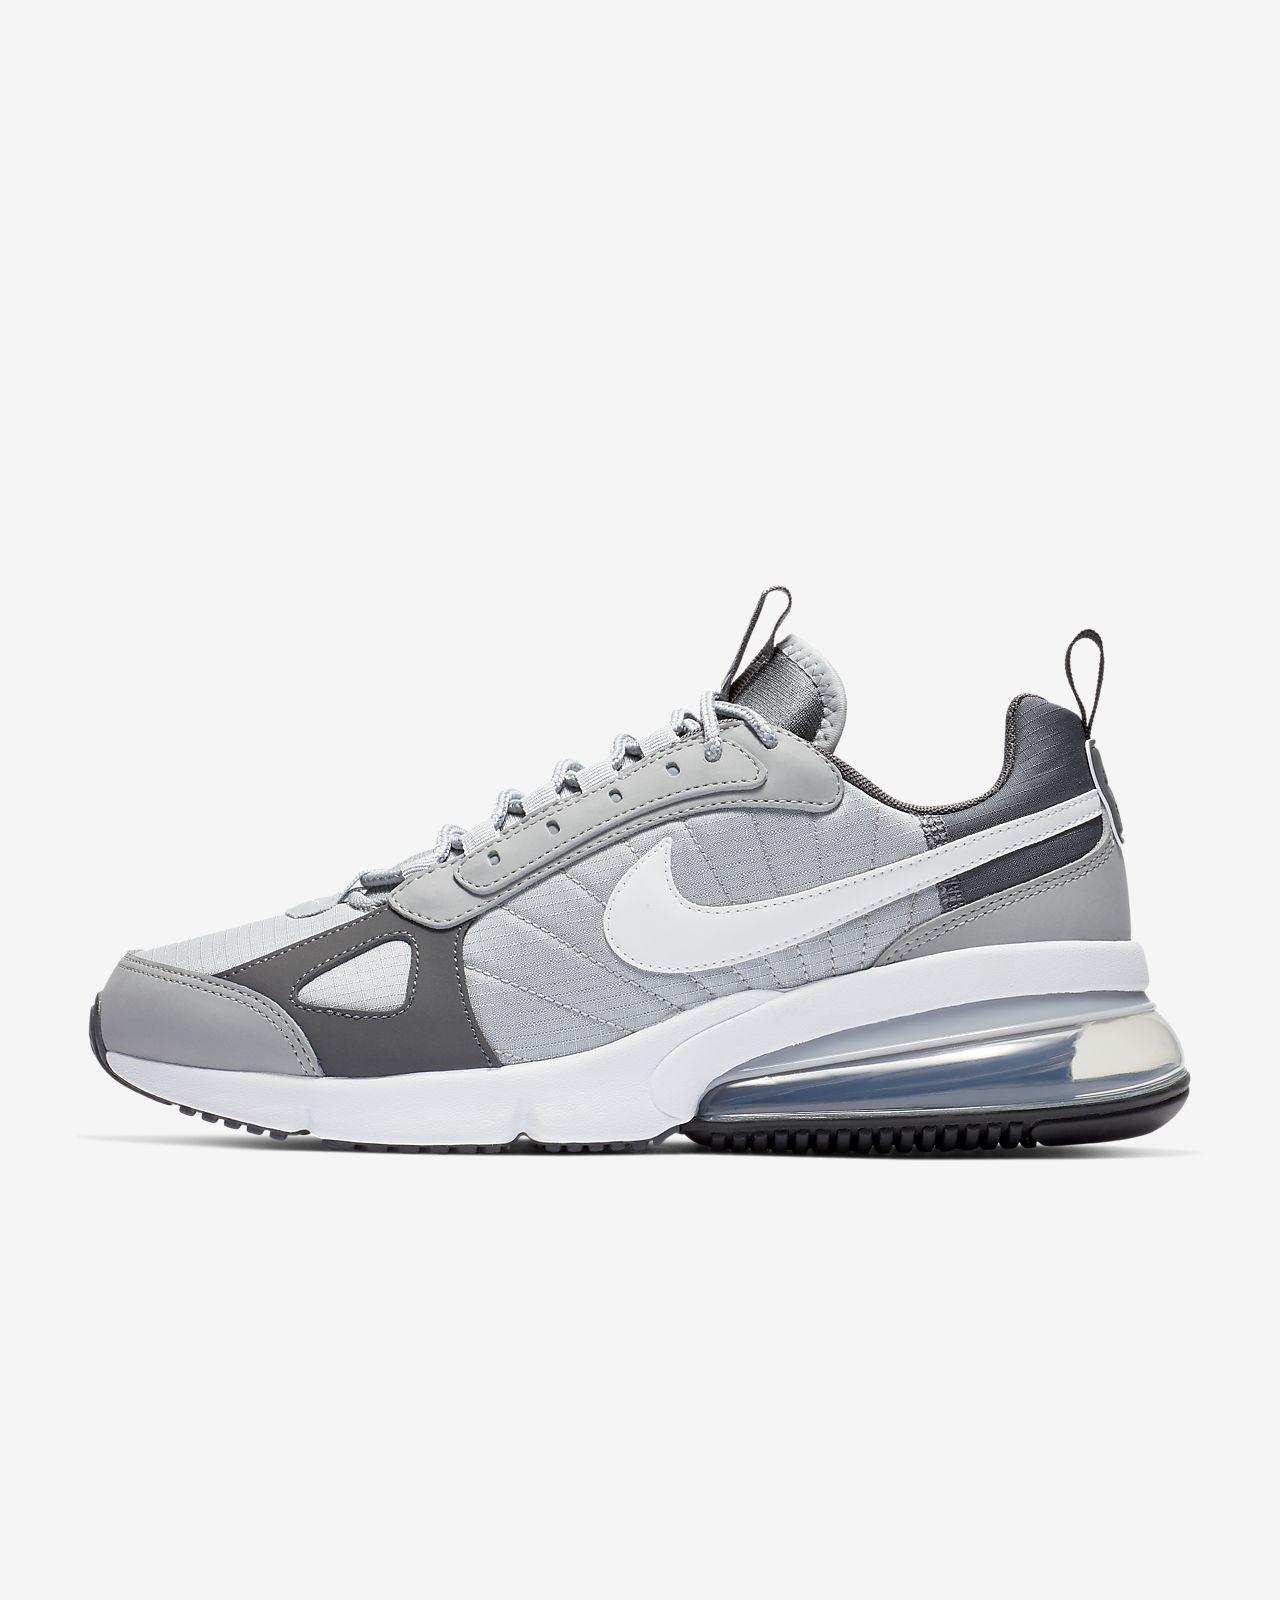 wholesale dealer 1b456 41f53 ... Scarpa Nike Air Max 270 Futura - Uomo